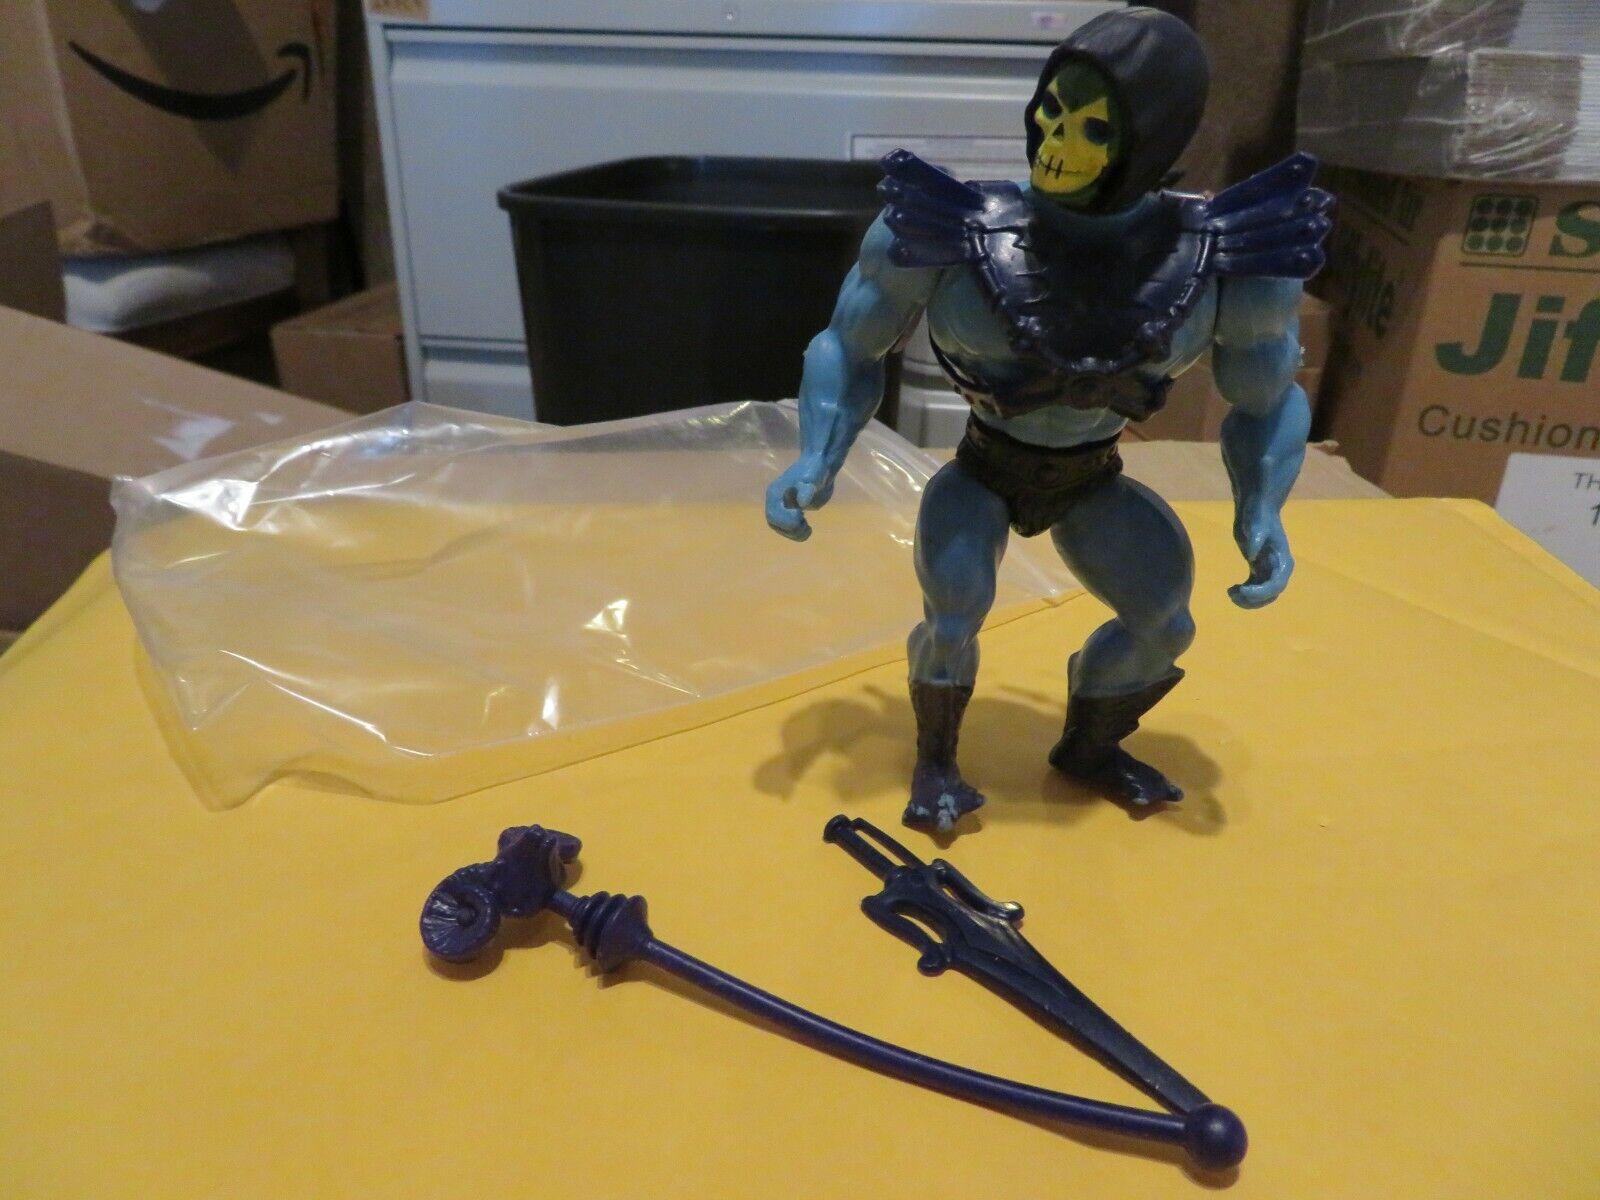 Vintage Amos del universo He-man Skeletor suave cabeza figura Mattel 1983 casi completa